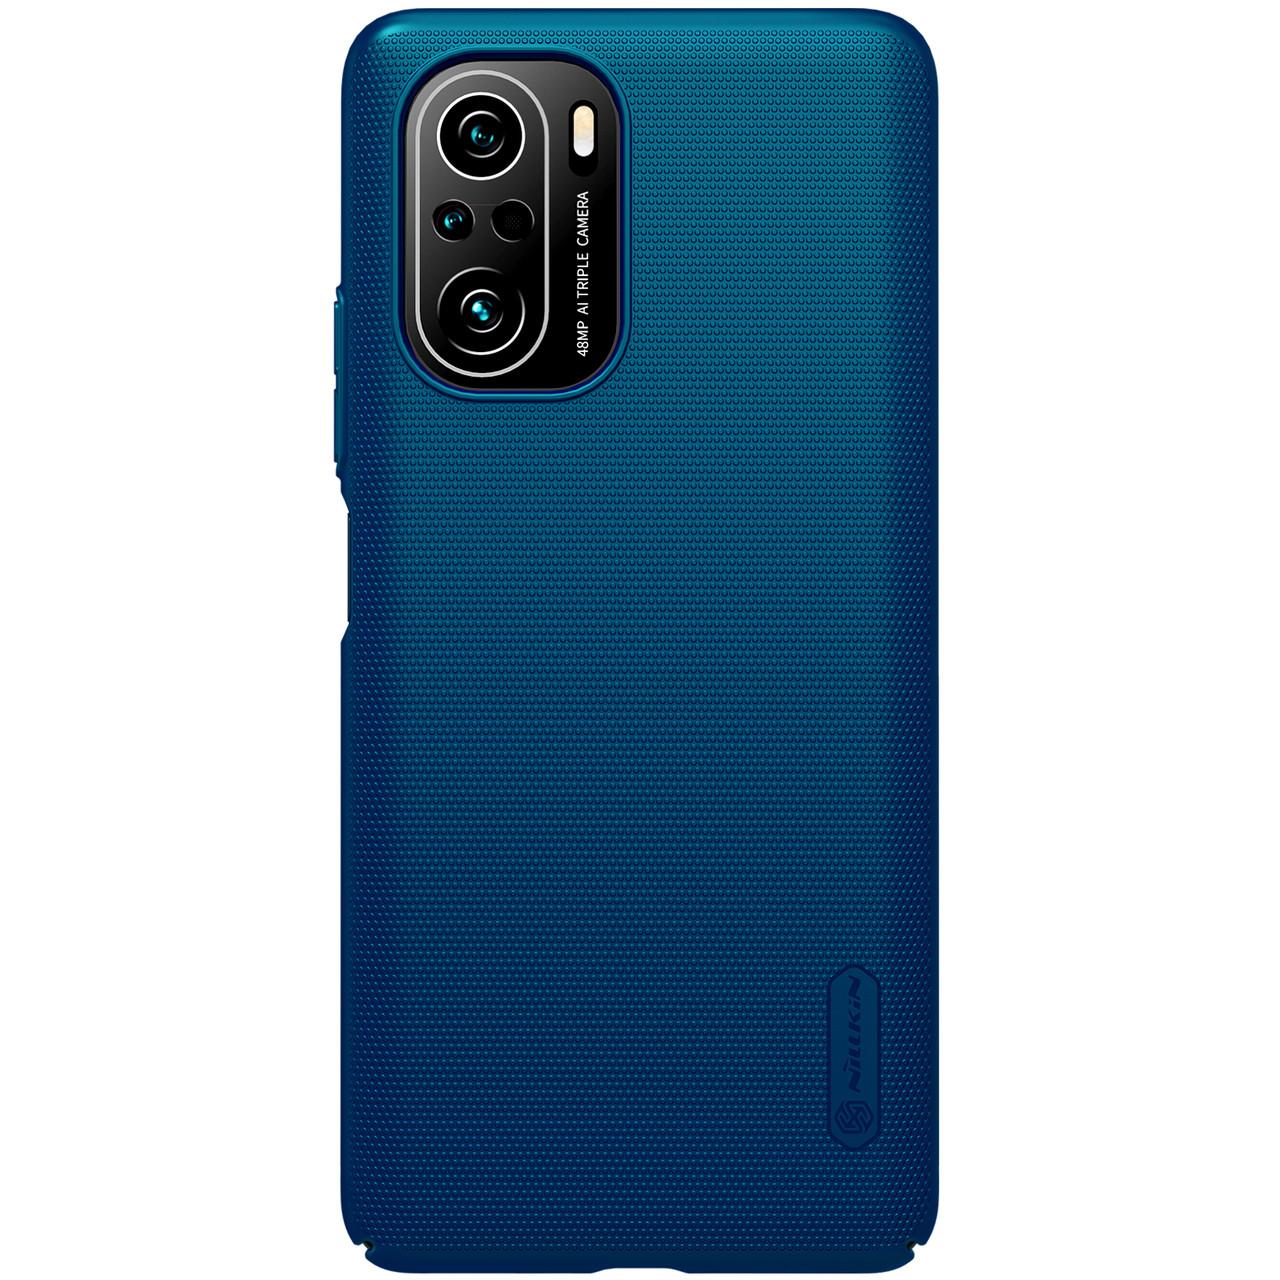 Защитный чехол Nillkin для Xiaomi POCO F3 / Redmi K40 / K40 Pro / K40 Pro+ (Super Frosted Shield) Blue Синий